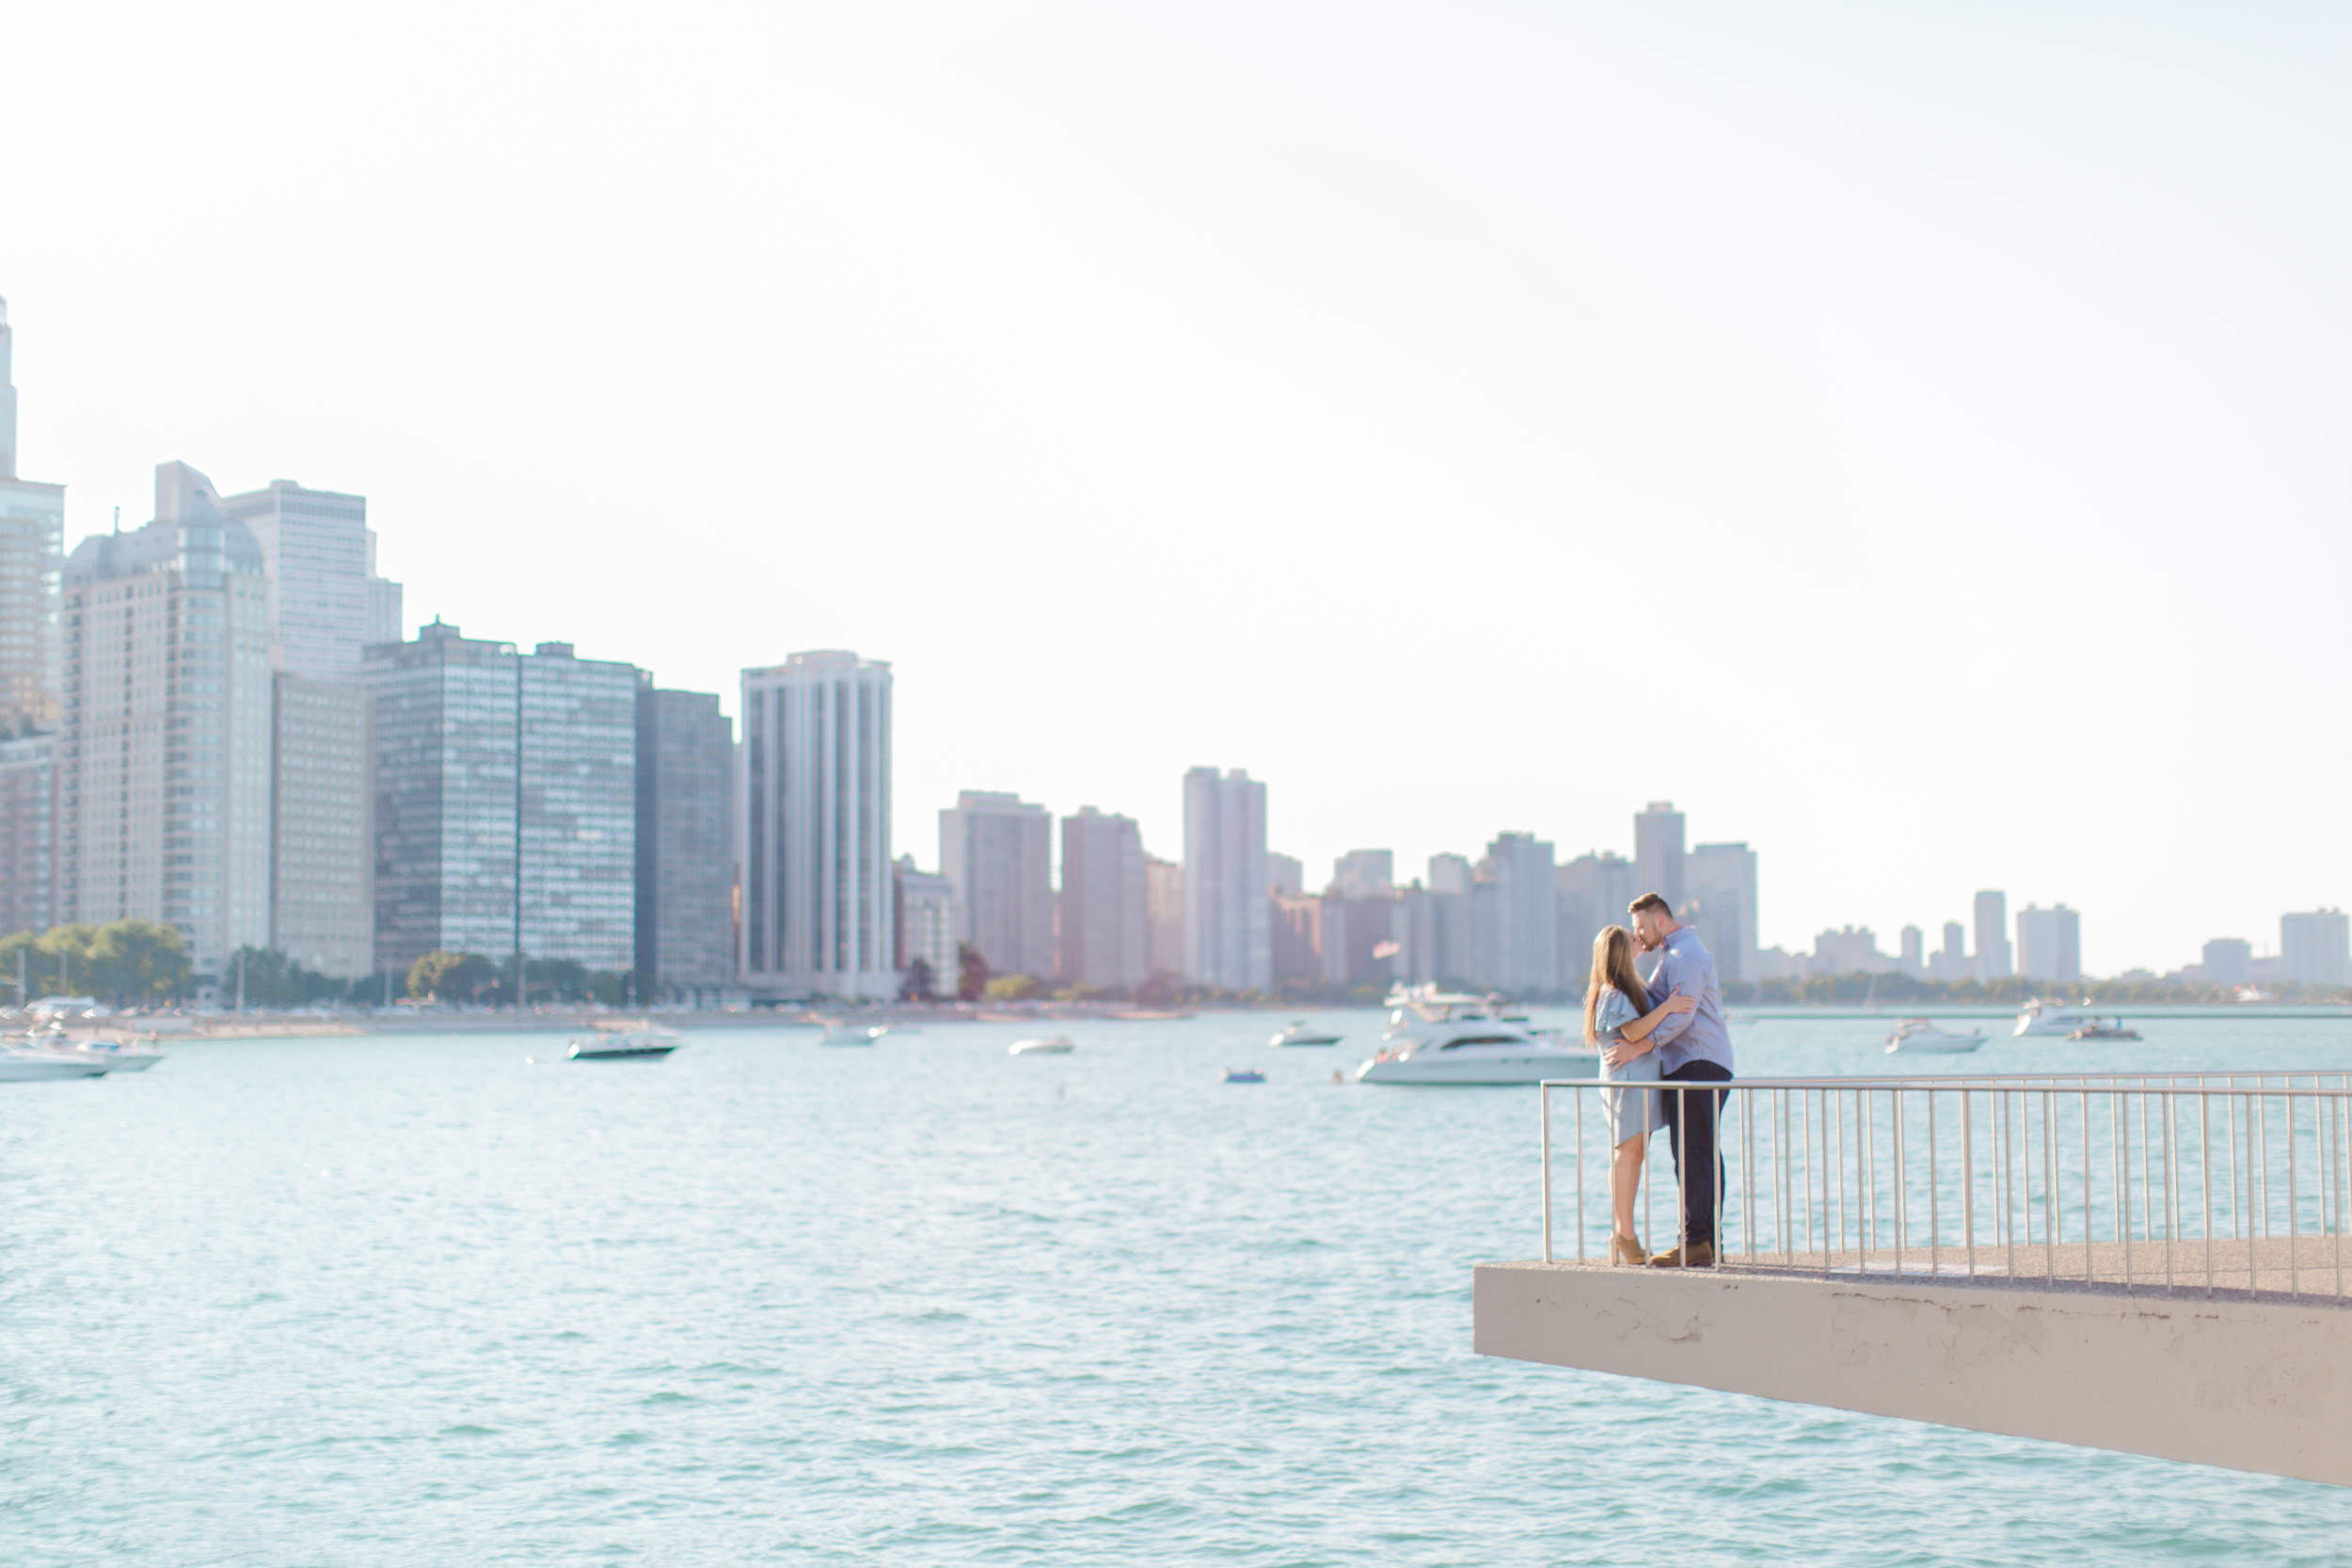 Bonphotage Chicago and Destination Wedding Photographer